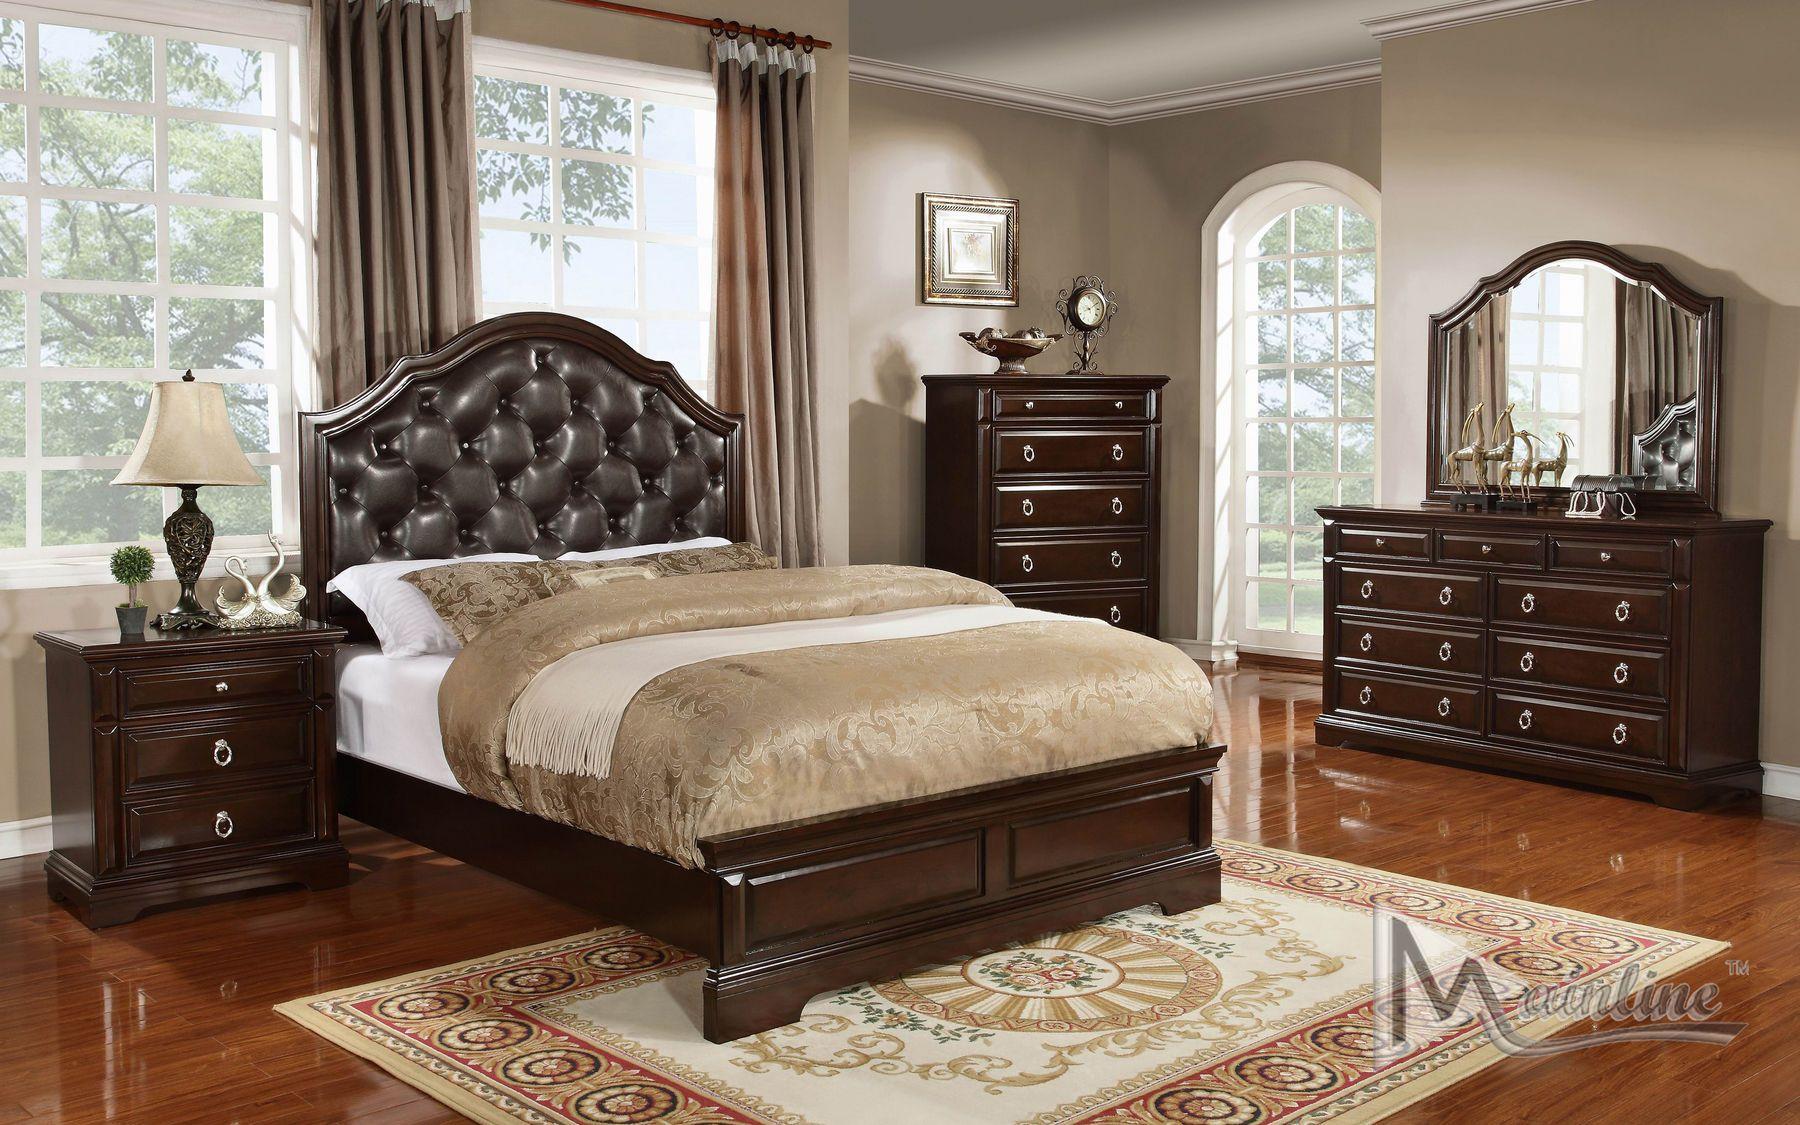 Mainline Inc Portofino Transitional Style Bedroom Set In ...